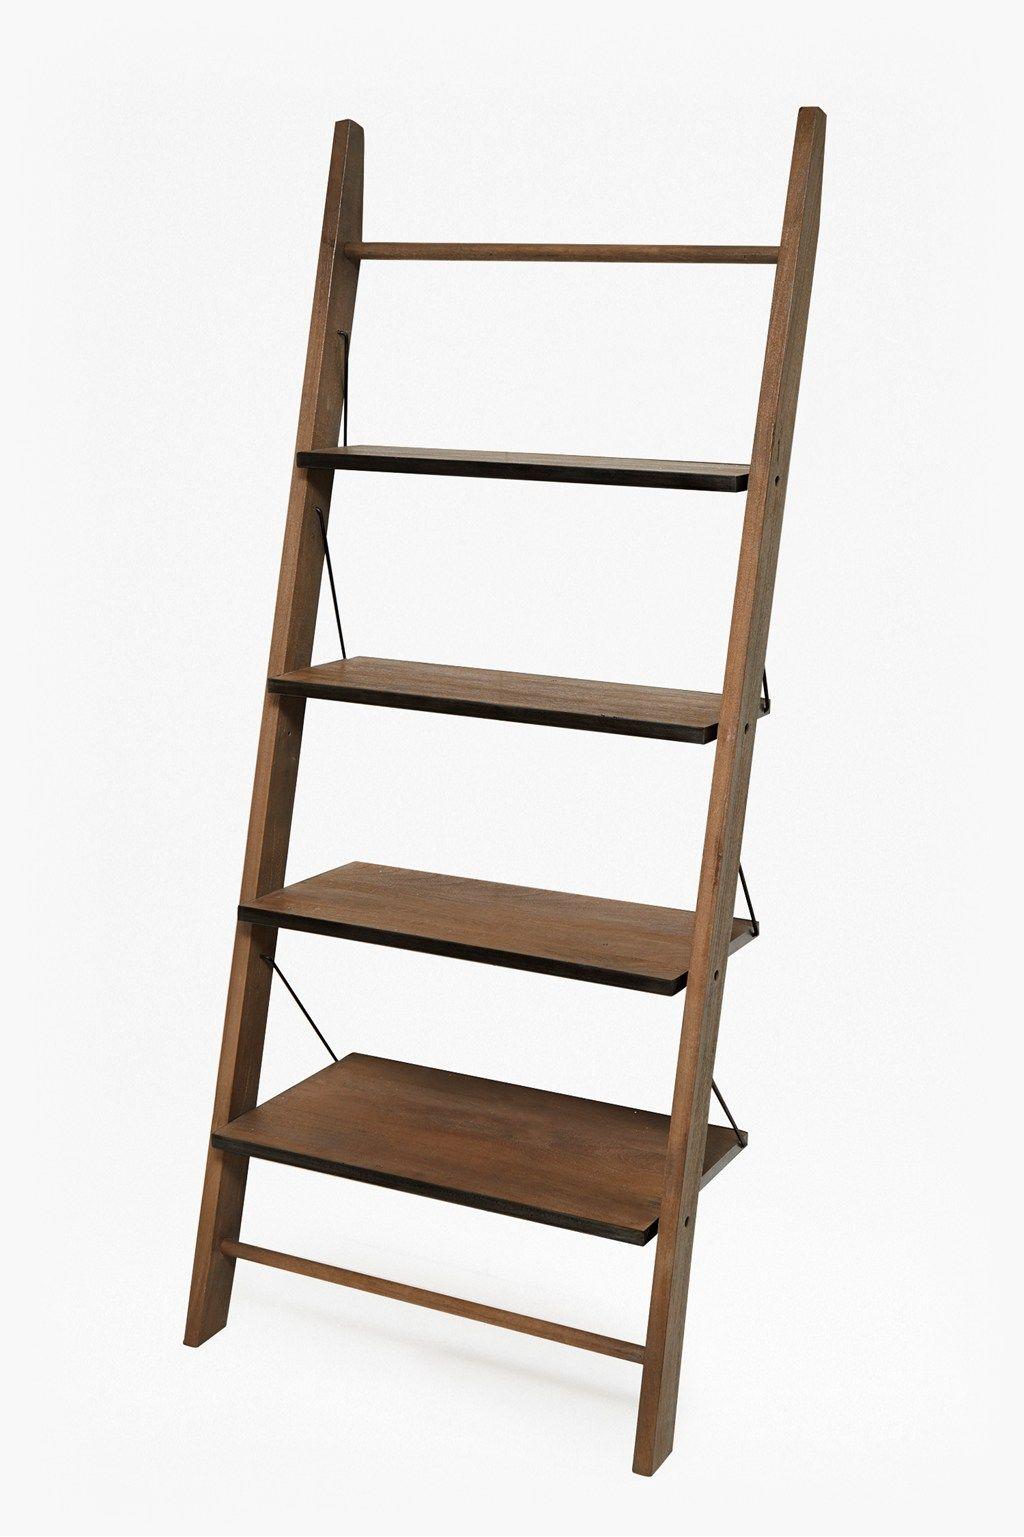 Wood Zinc Ladder Shelving With Images Shelves Wood Wooden